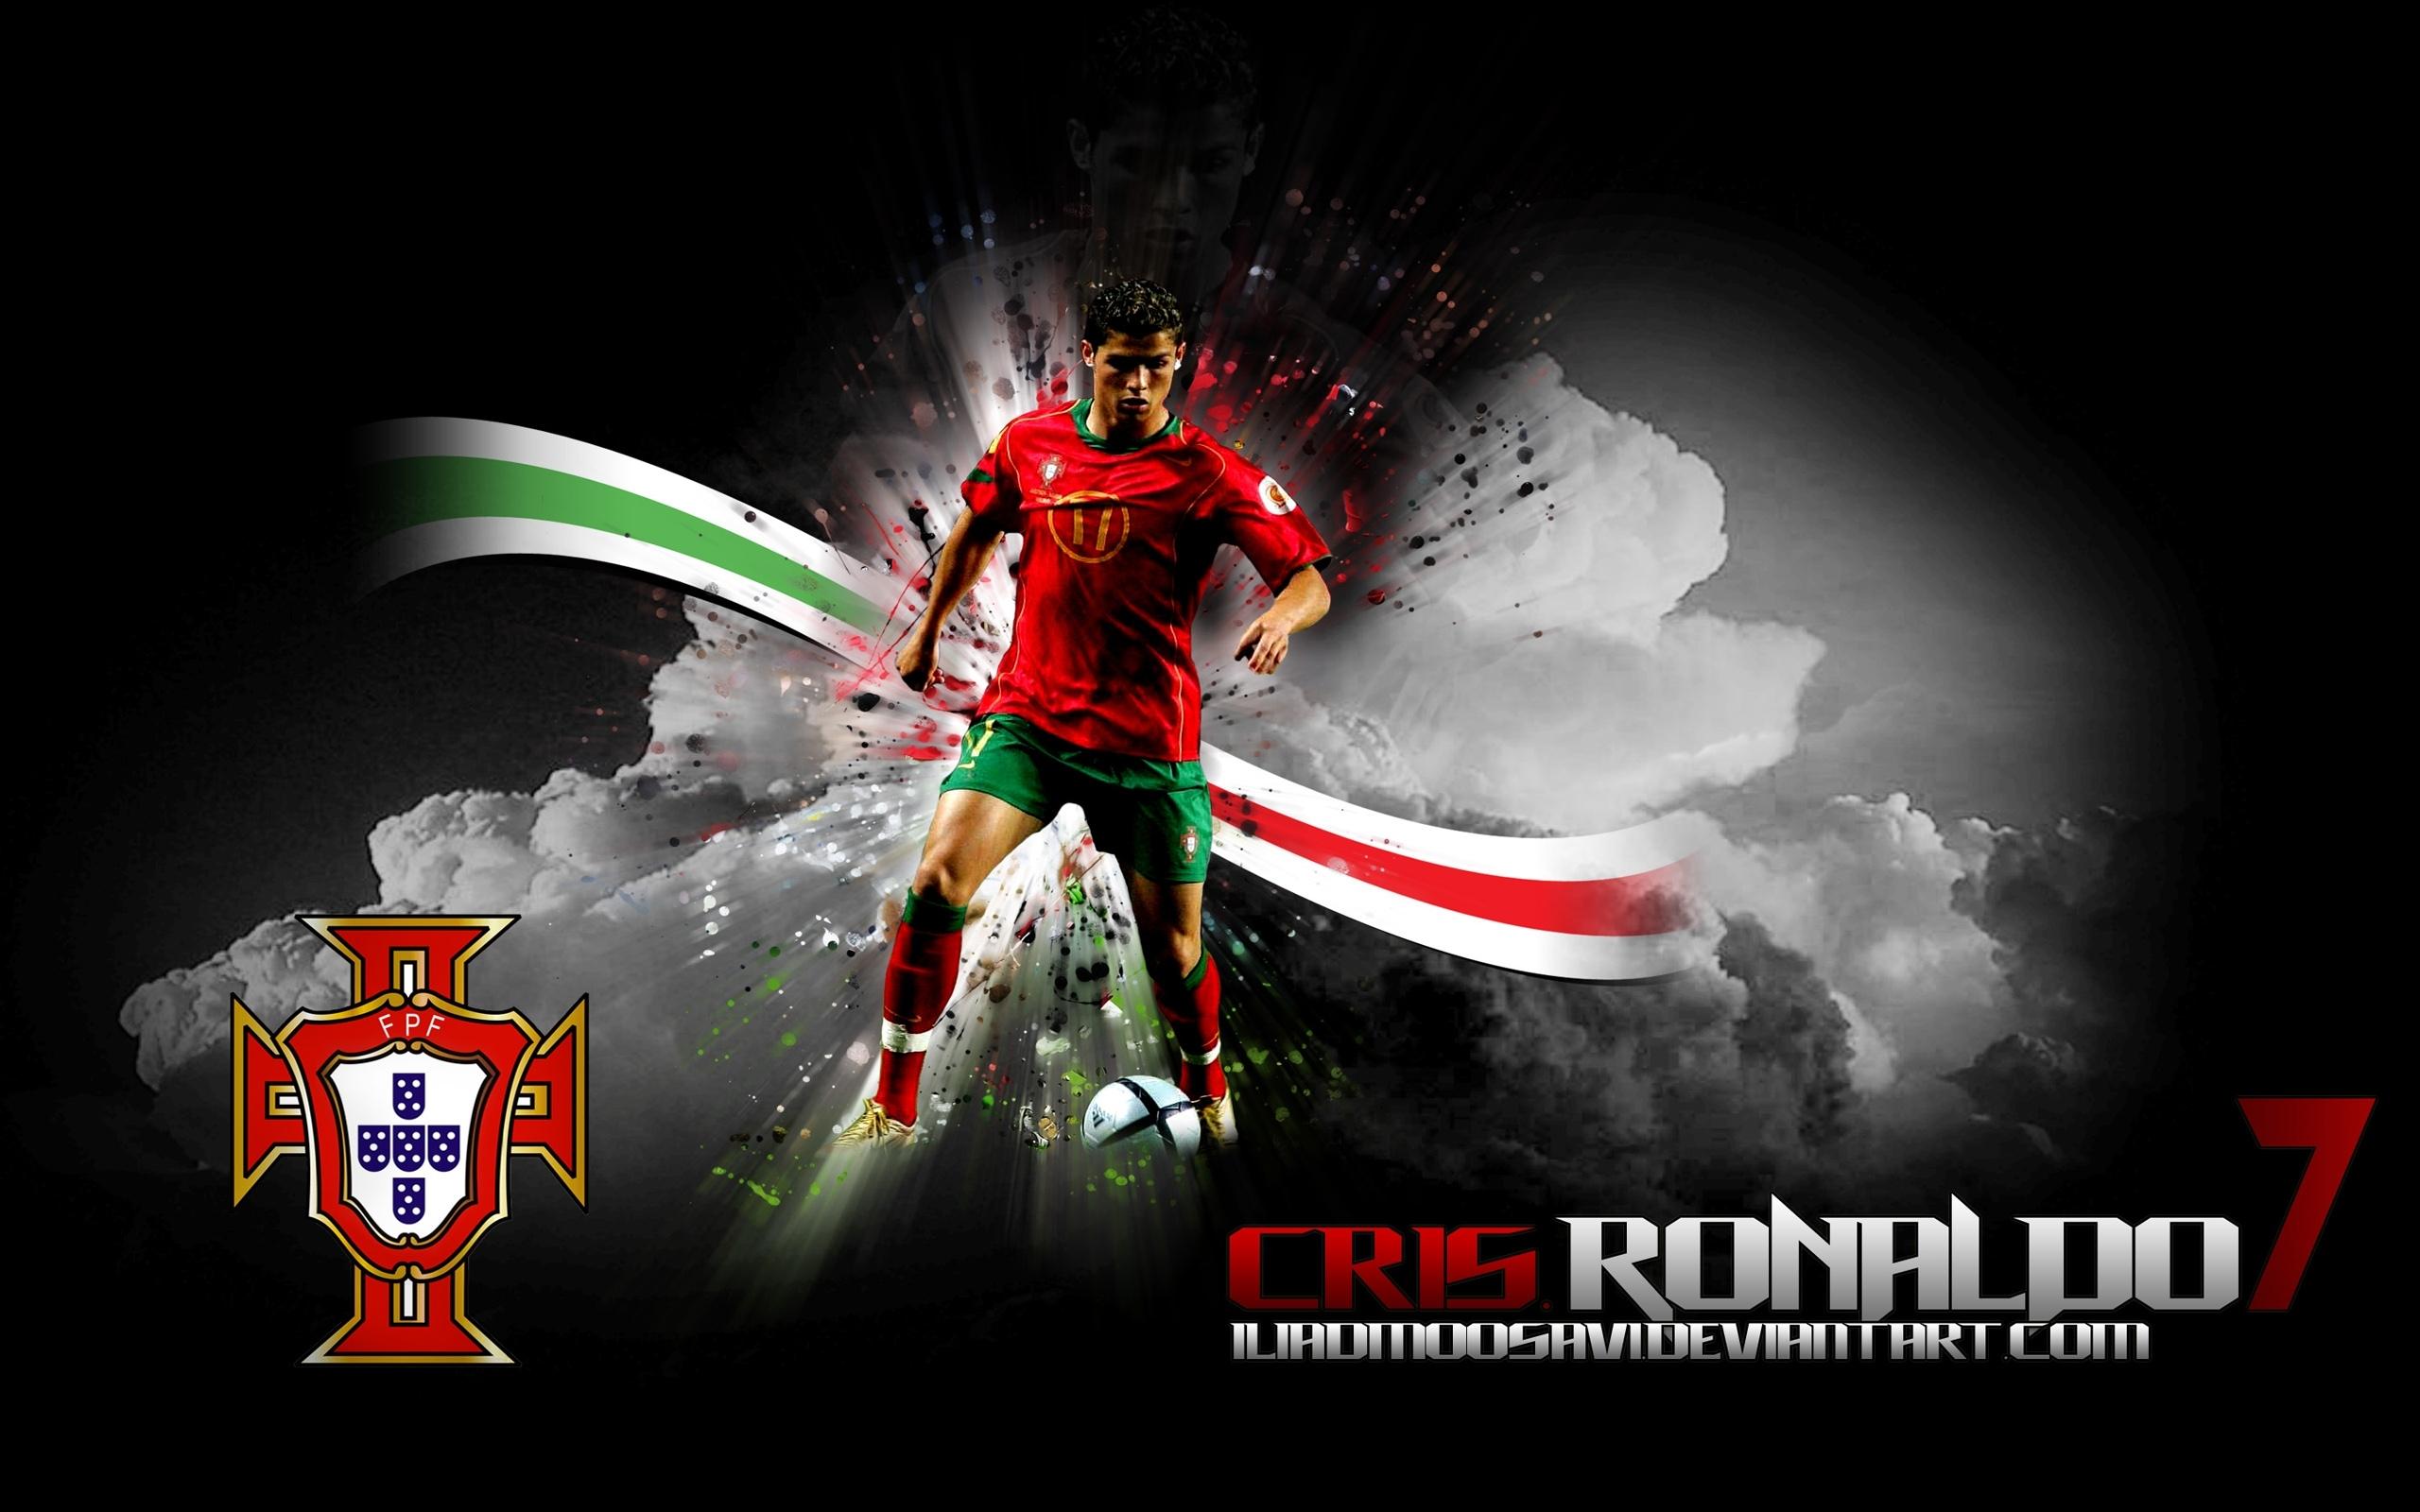 Hd wallpaper robot - Cristiano Ronaldo Widescreen Wallpaper 2560x1600